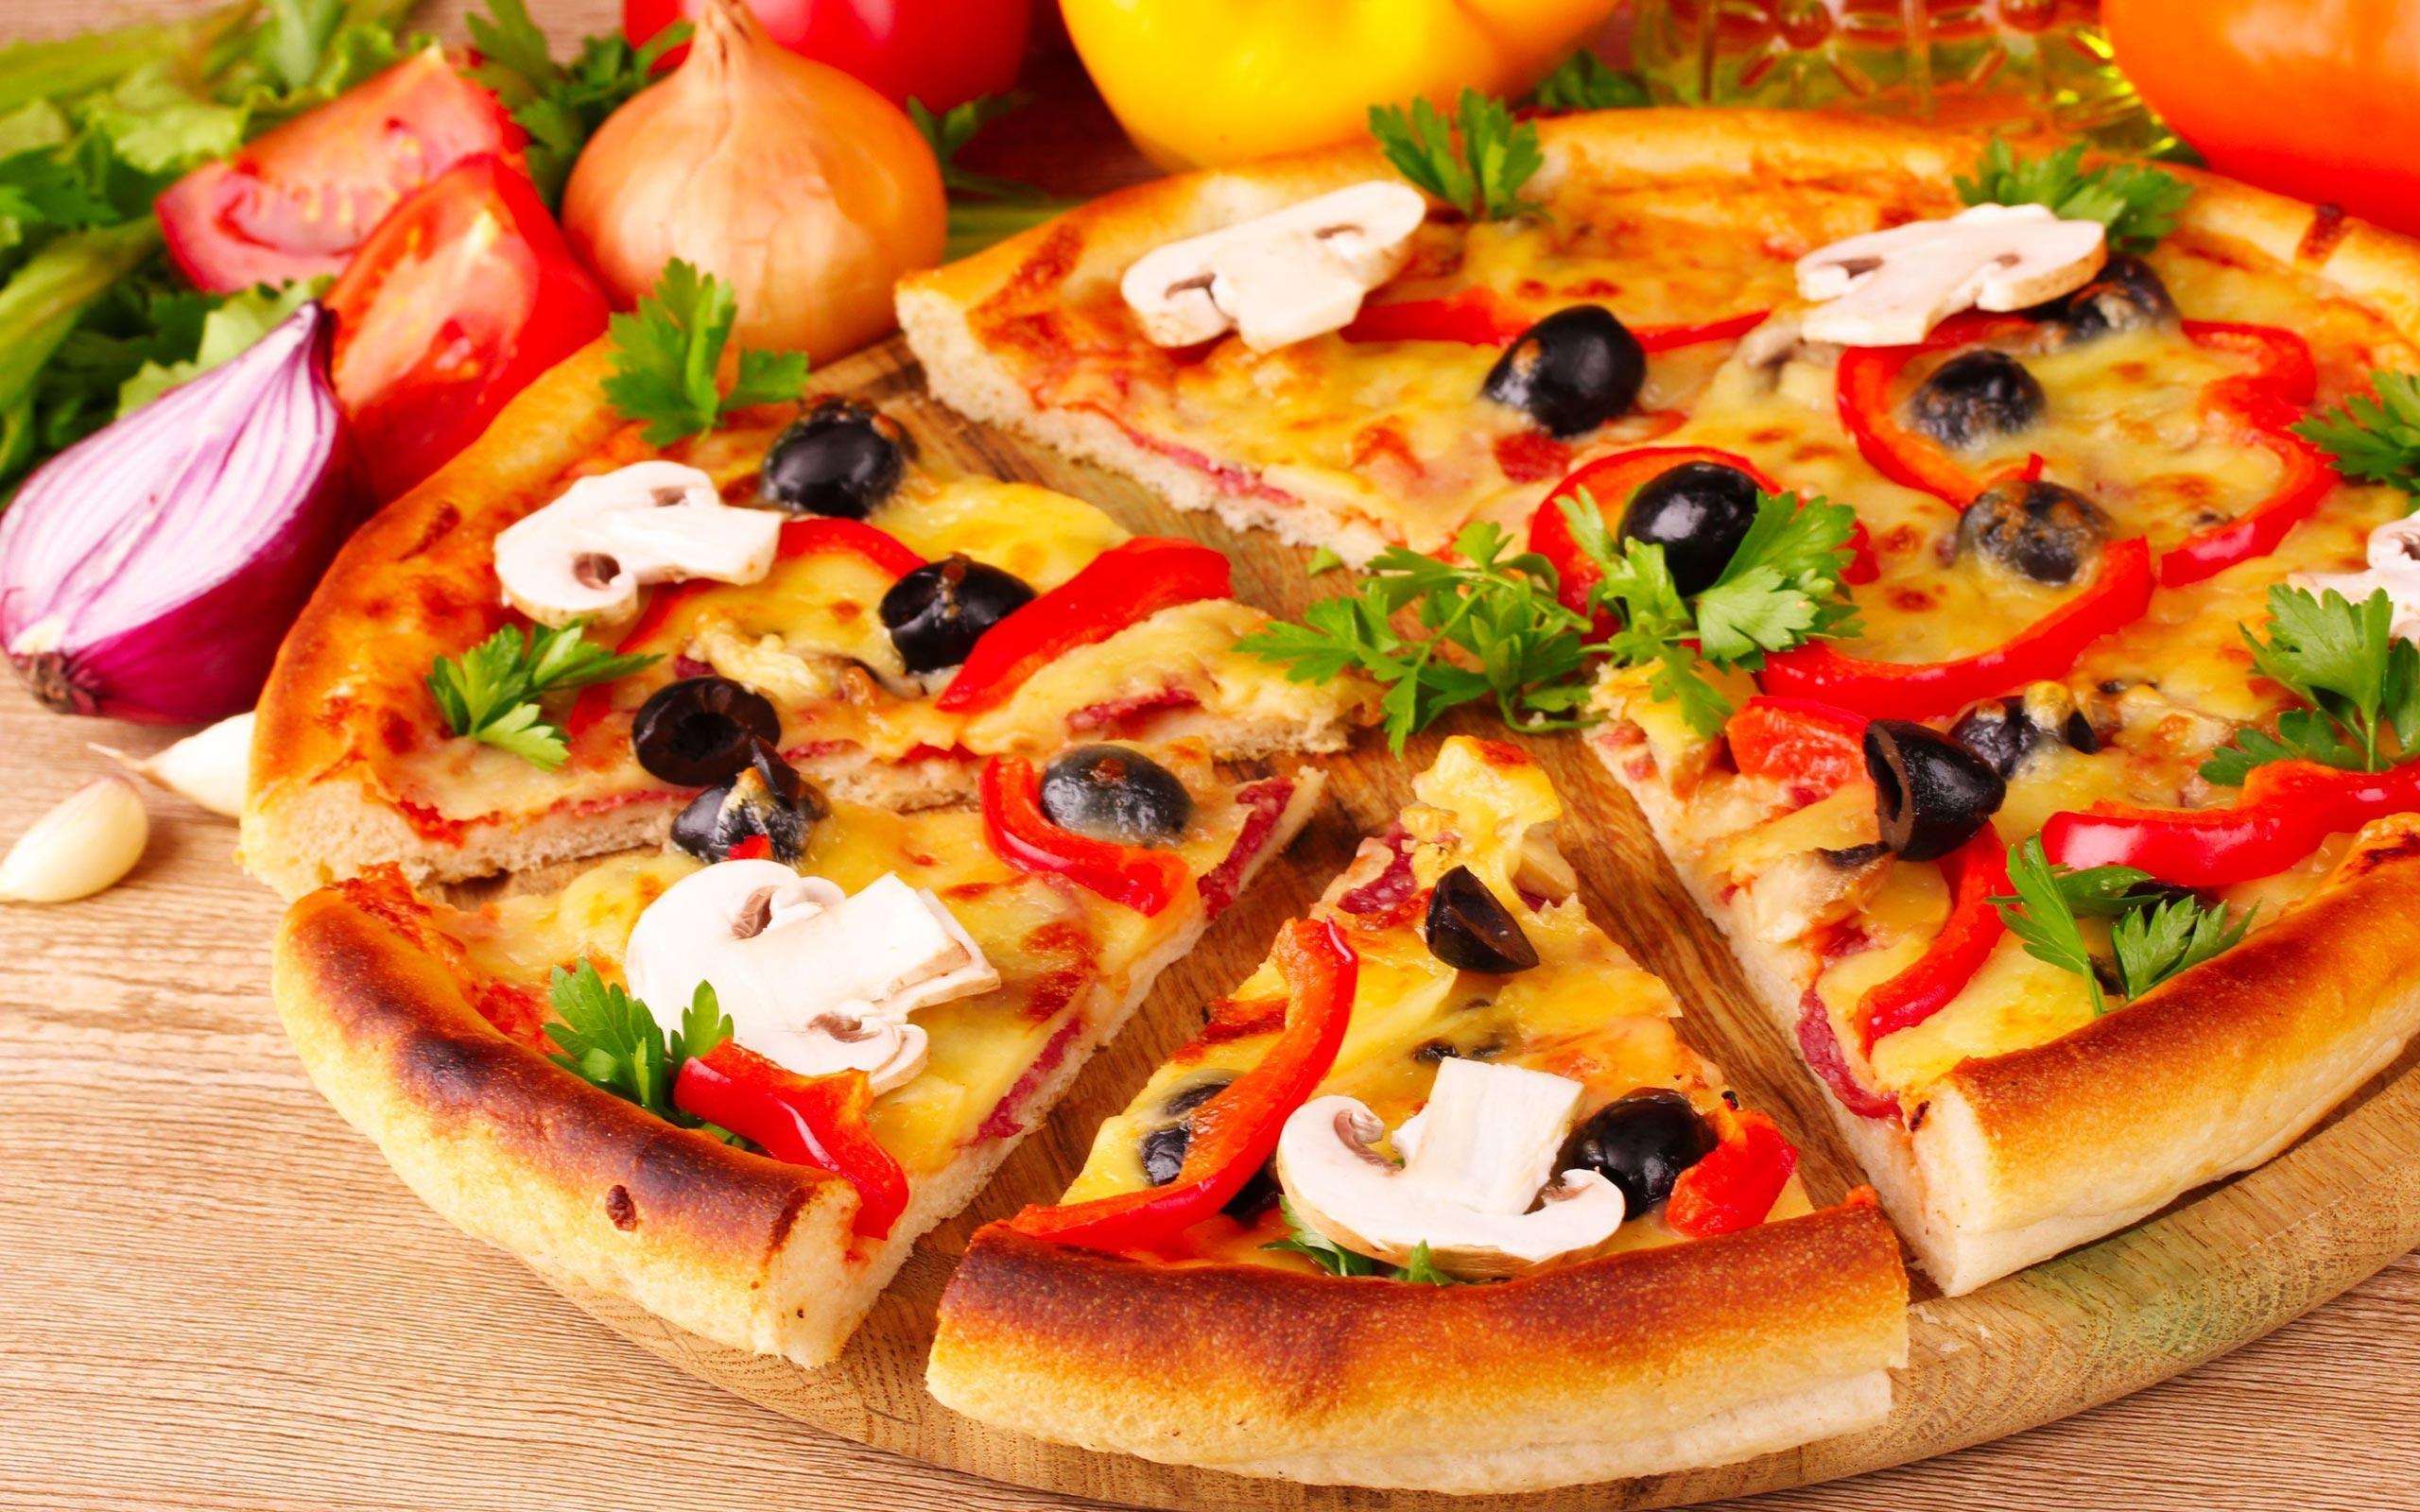 pizza-hd-wallpaper-high-quality-11yzn3